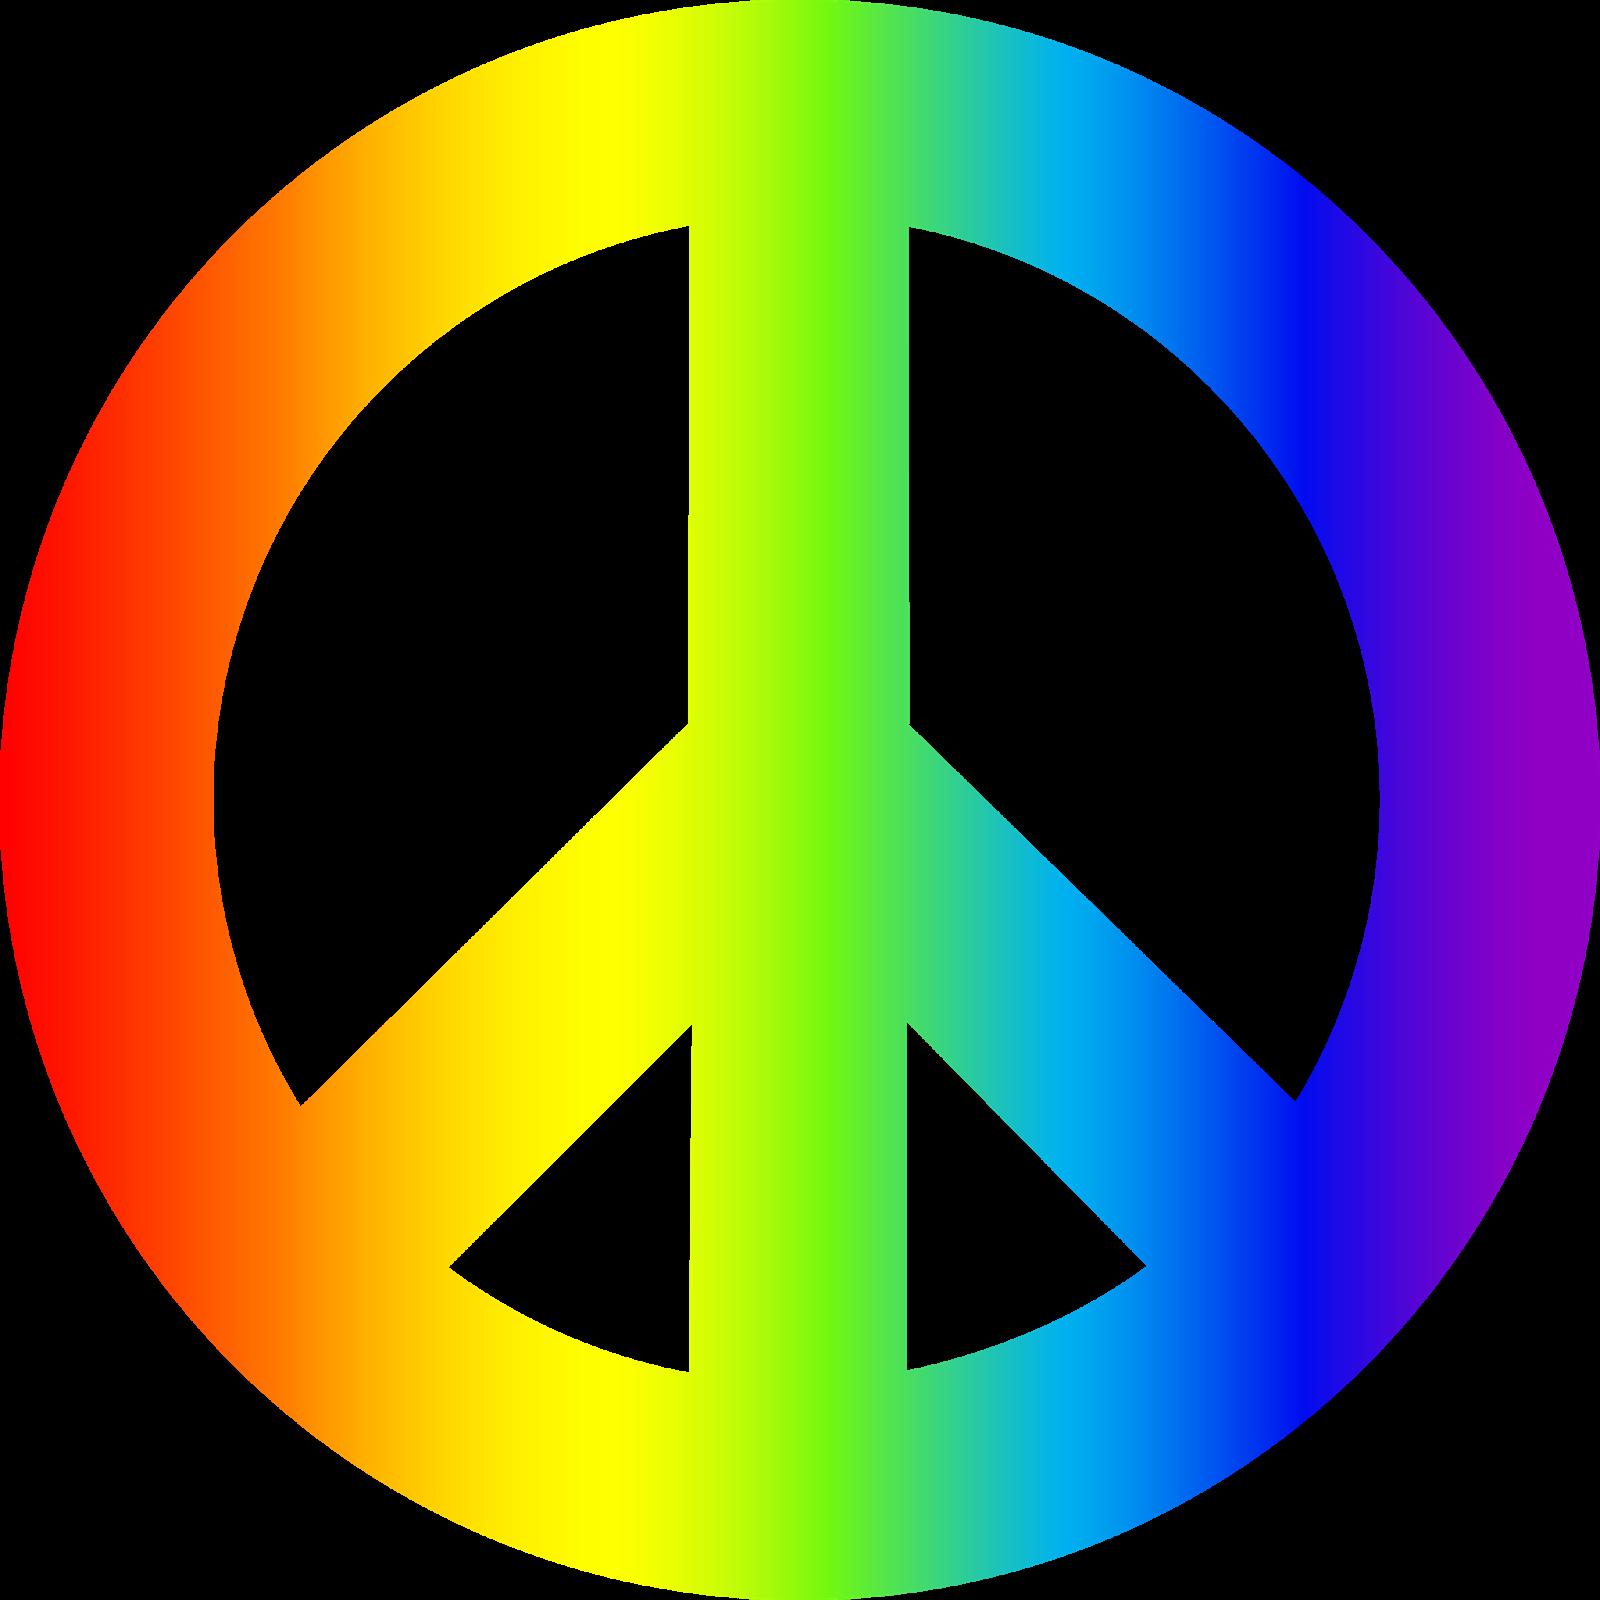 Imagenes y fotos simbolos. Forgiveness clipart peace conflict